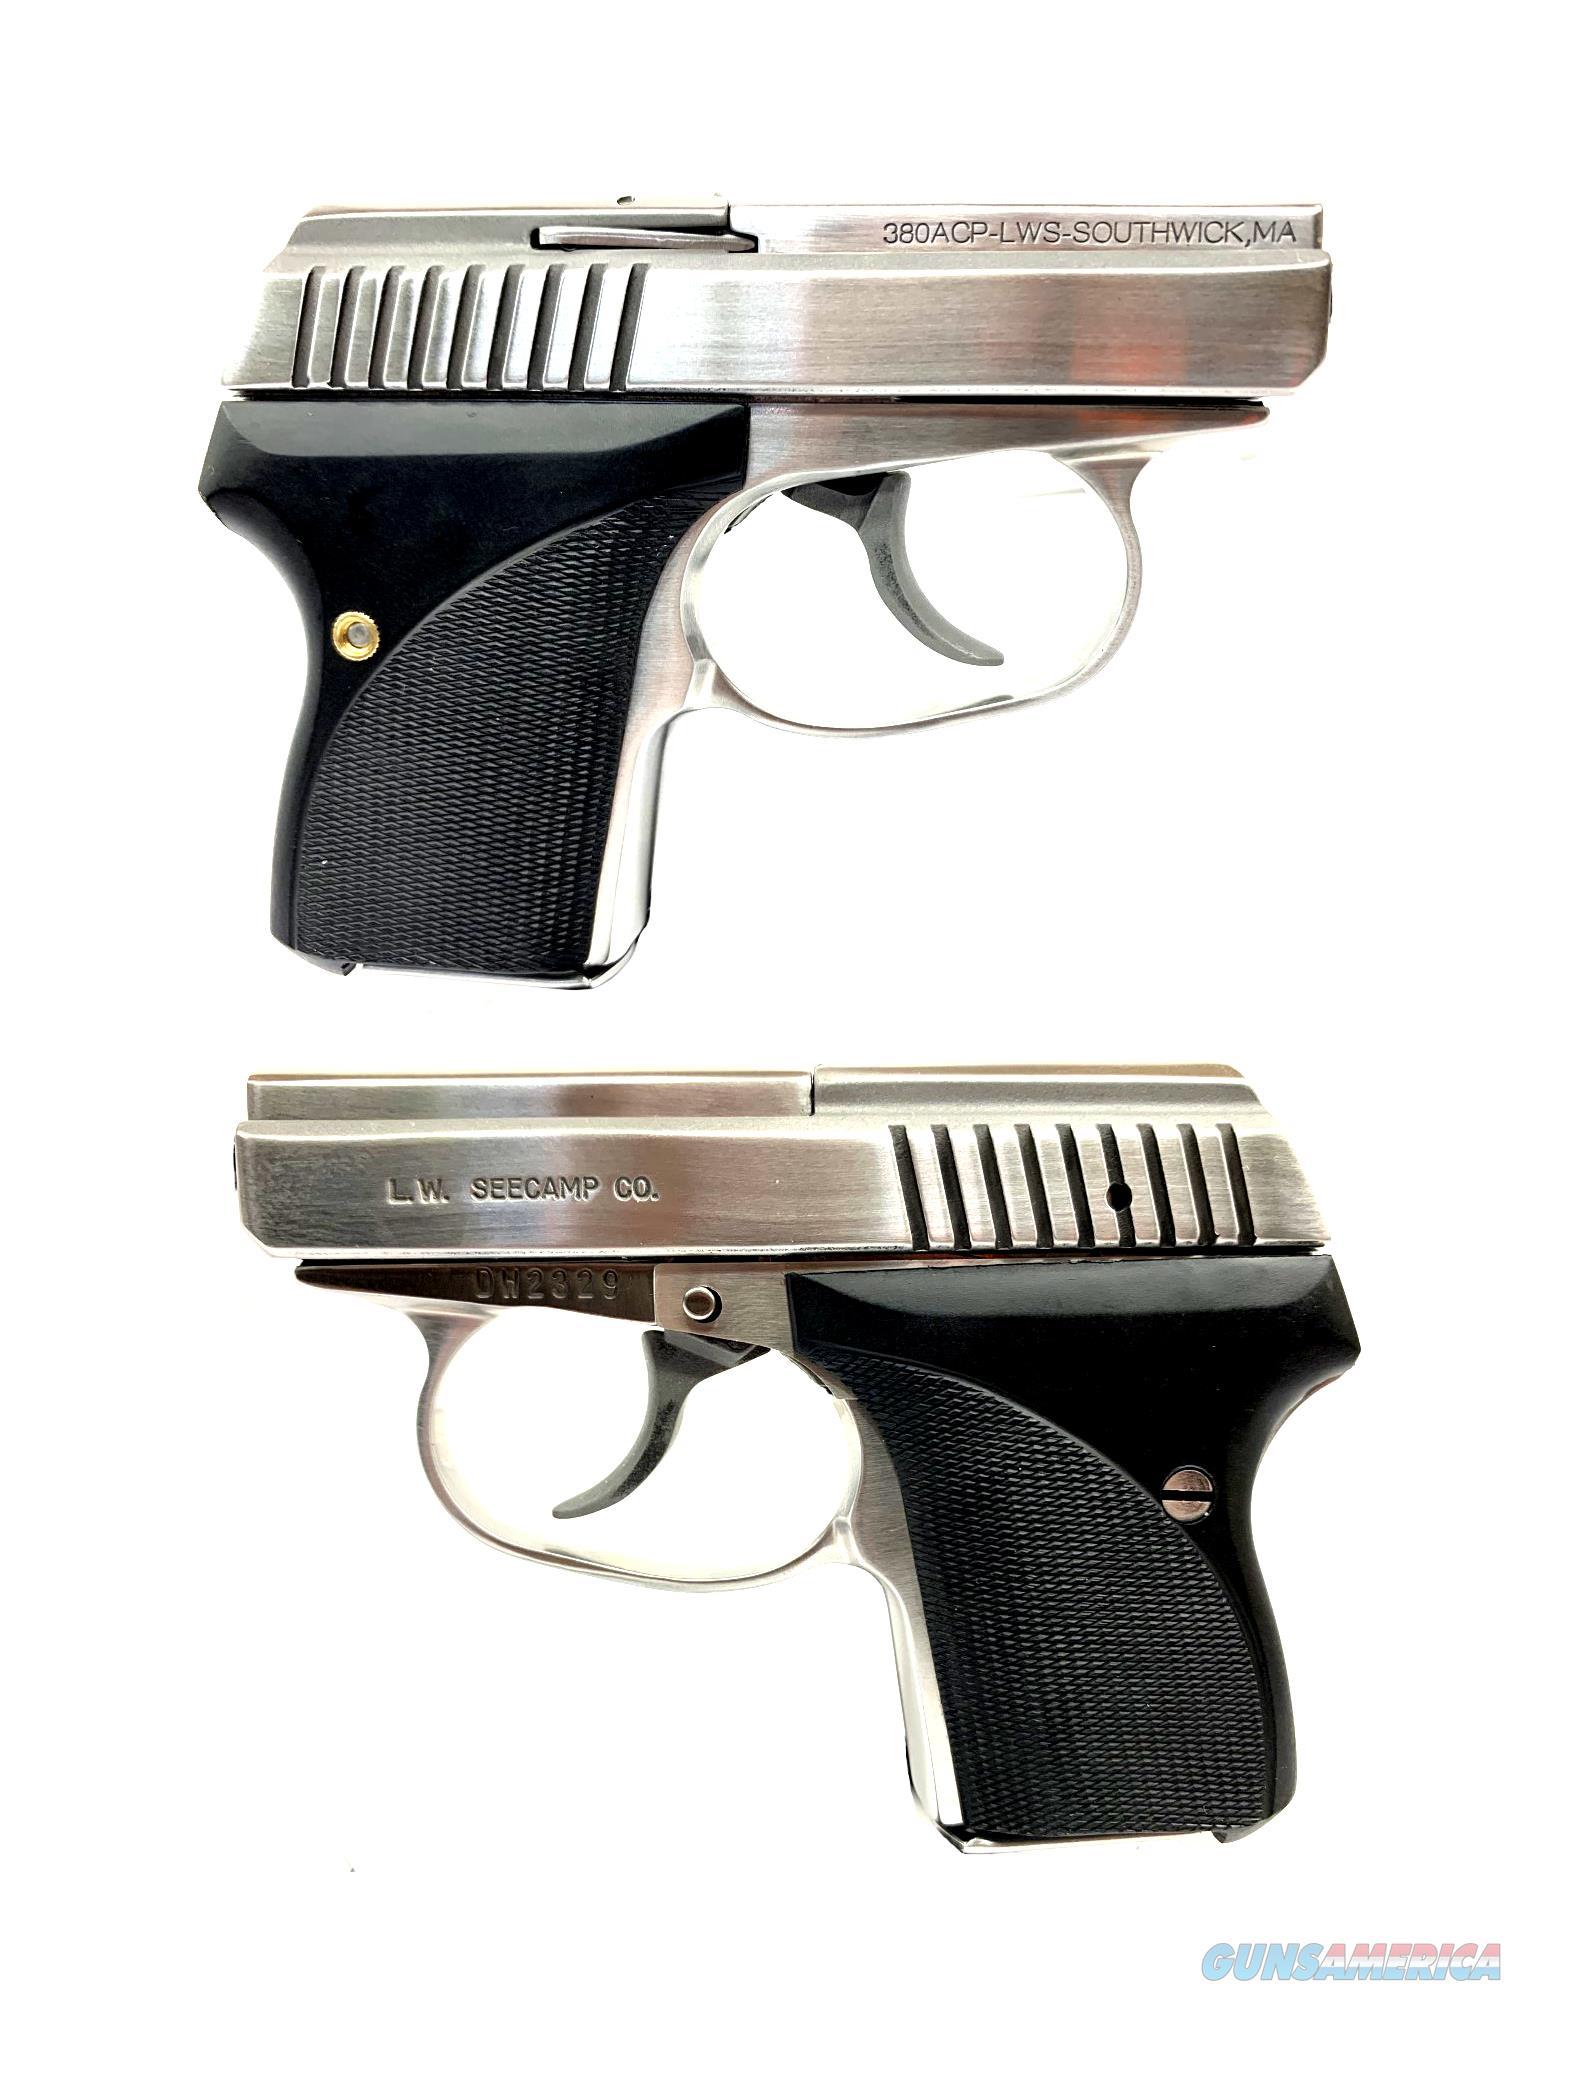 Seecamp LWS380 Semi-Automatic Pistol  Guns > Pistols > Seecamp Pistols